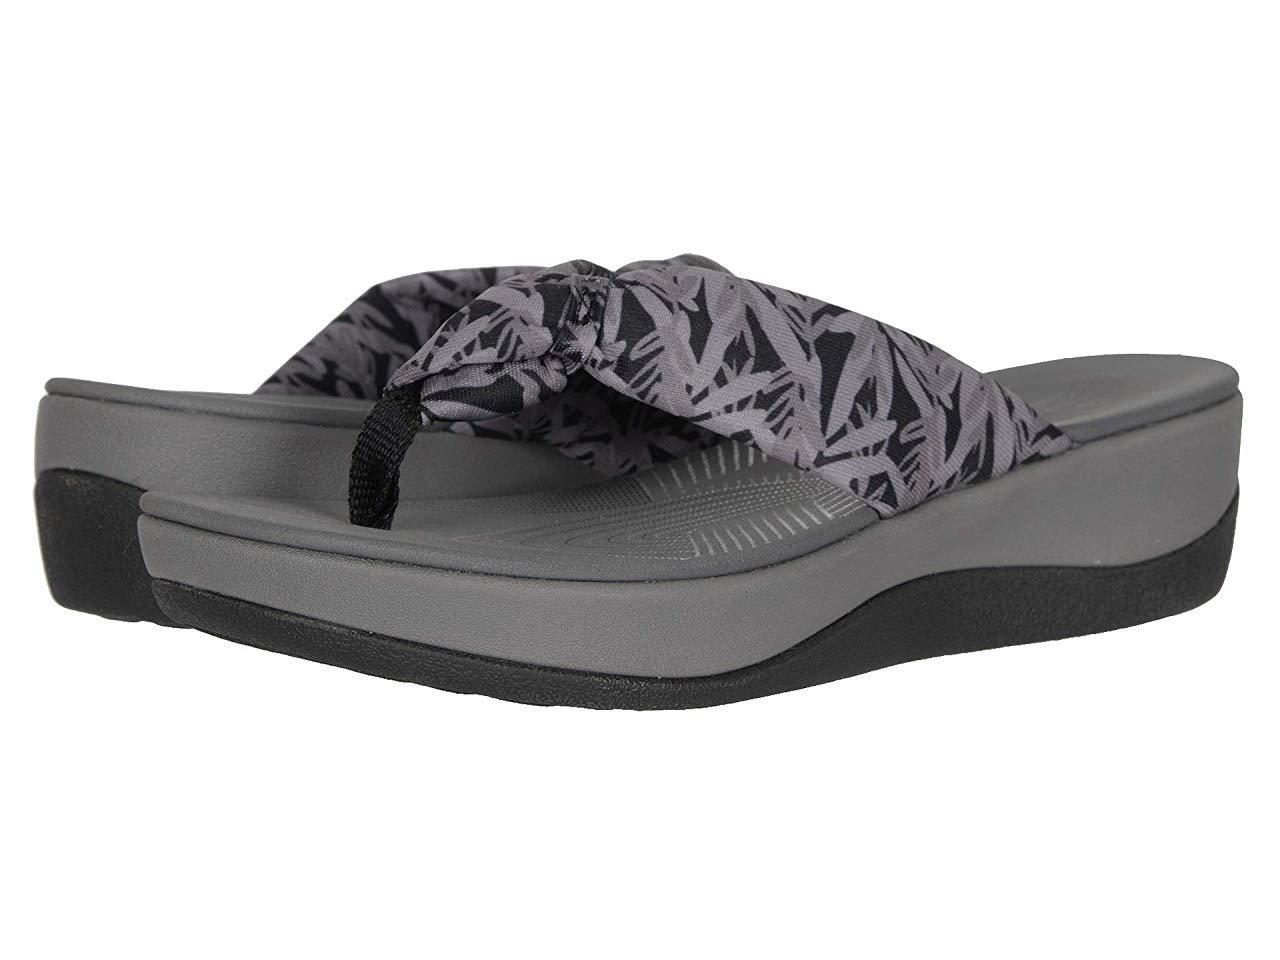 Сандали/Вьетнамки Clarks Arla Glison Black/Grey Floral Textile